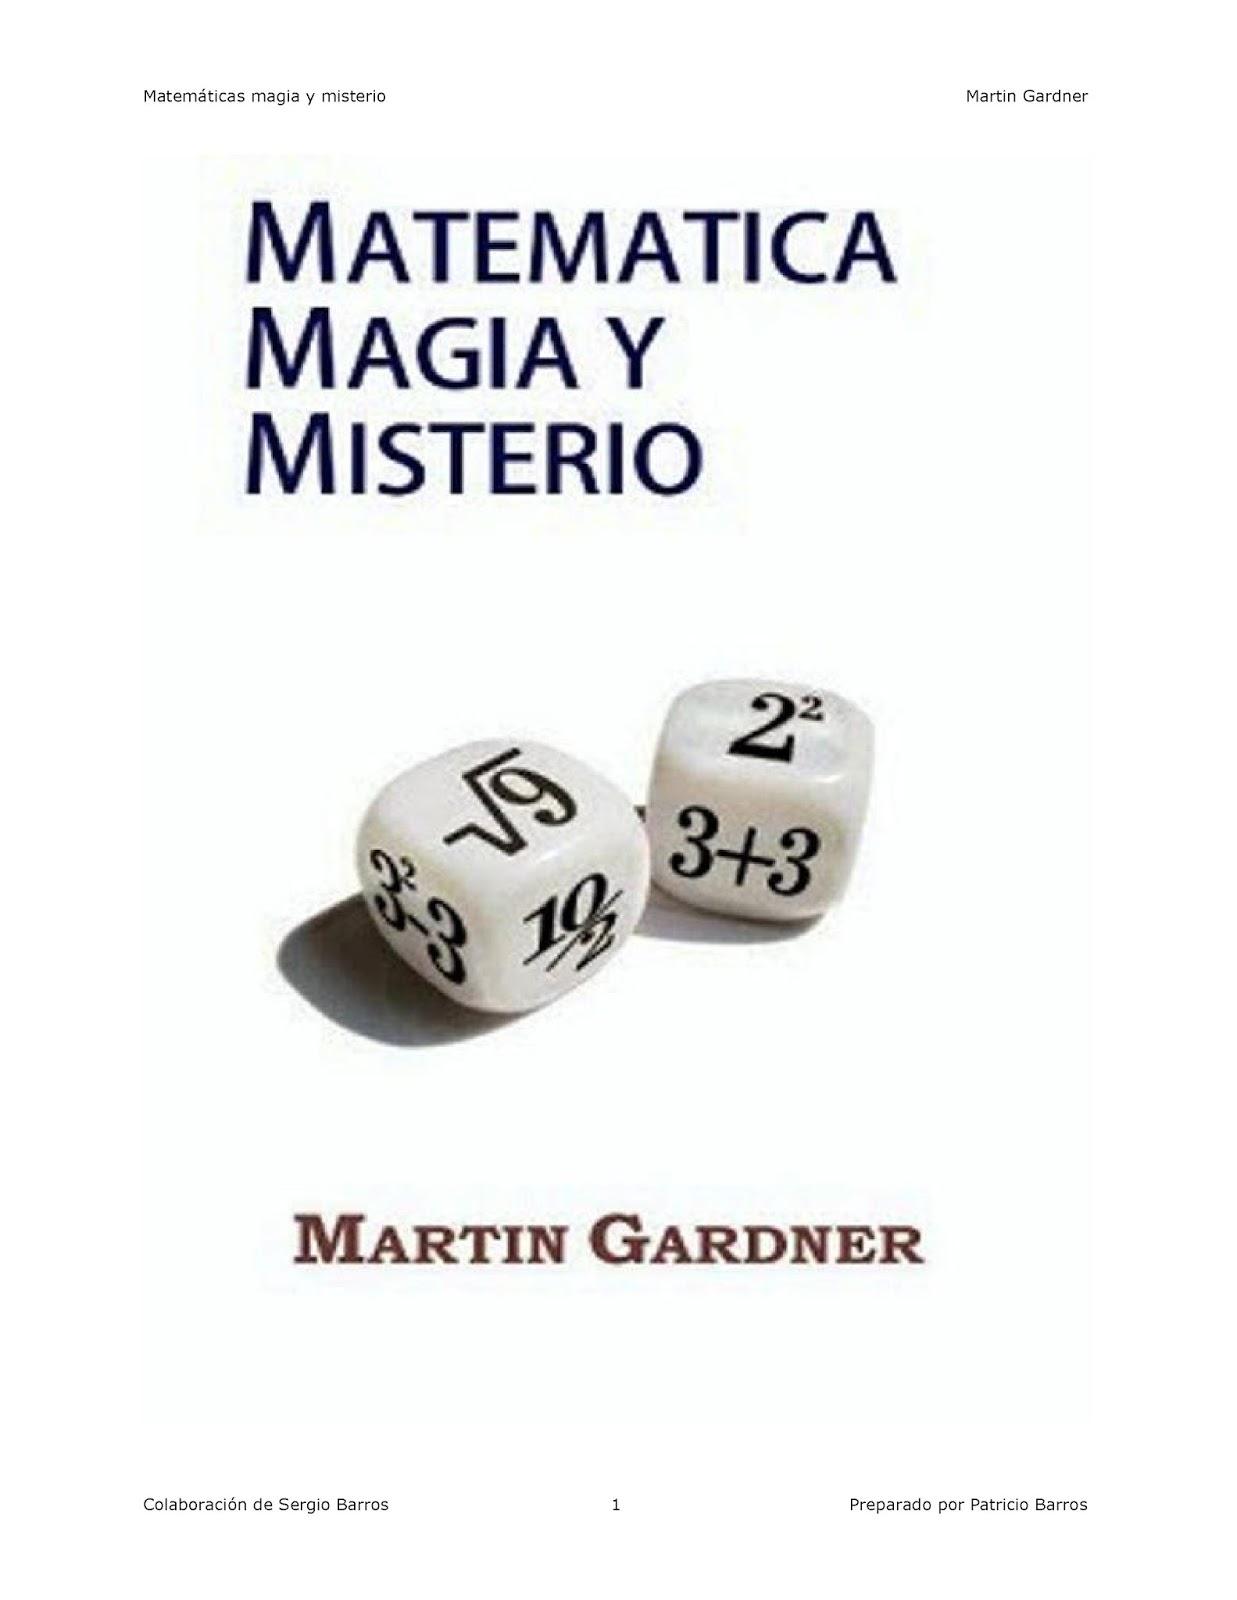 Matemática magia y misterio – Martin Gardner